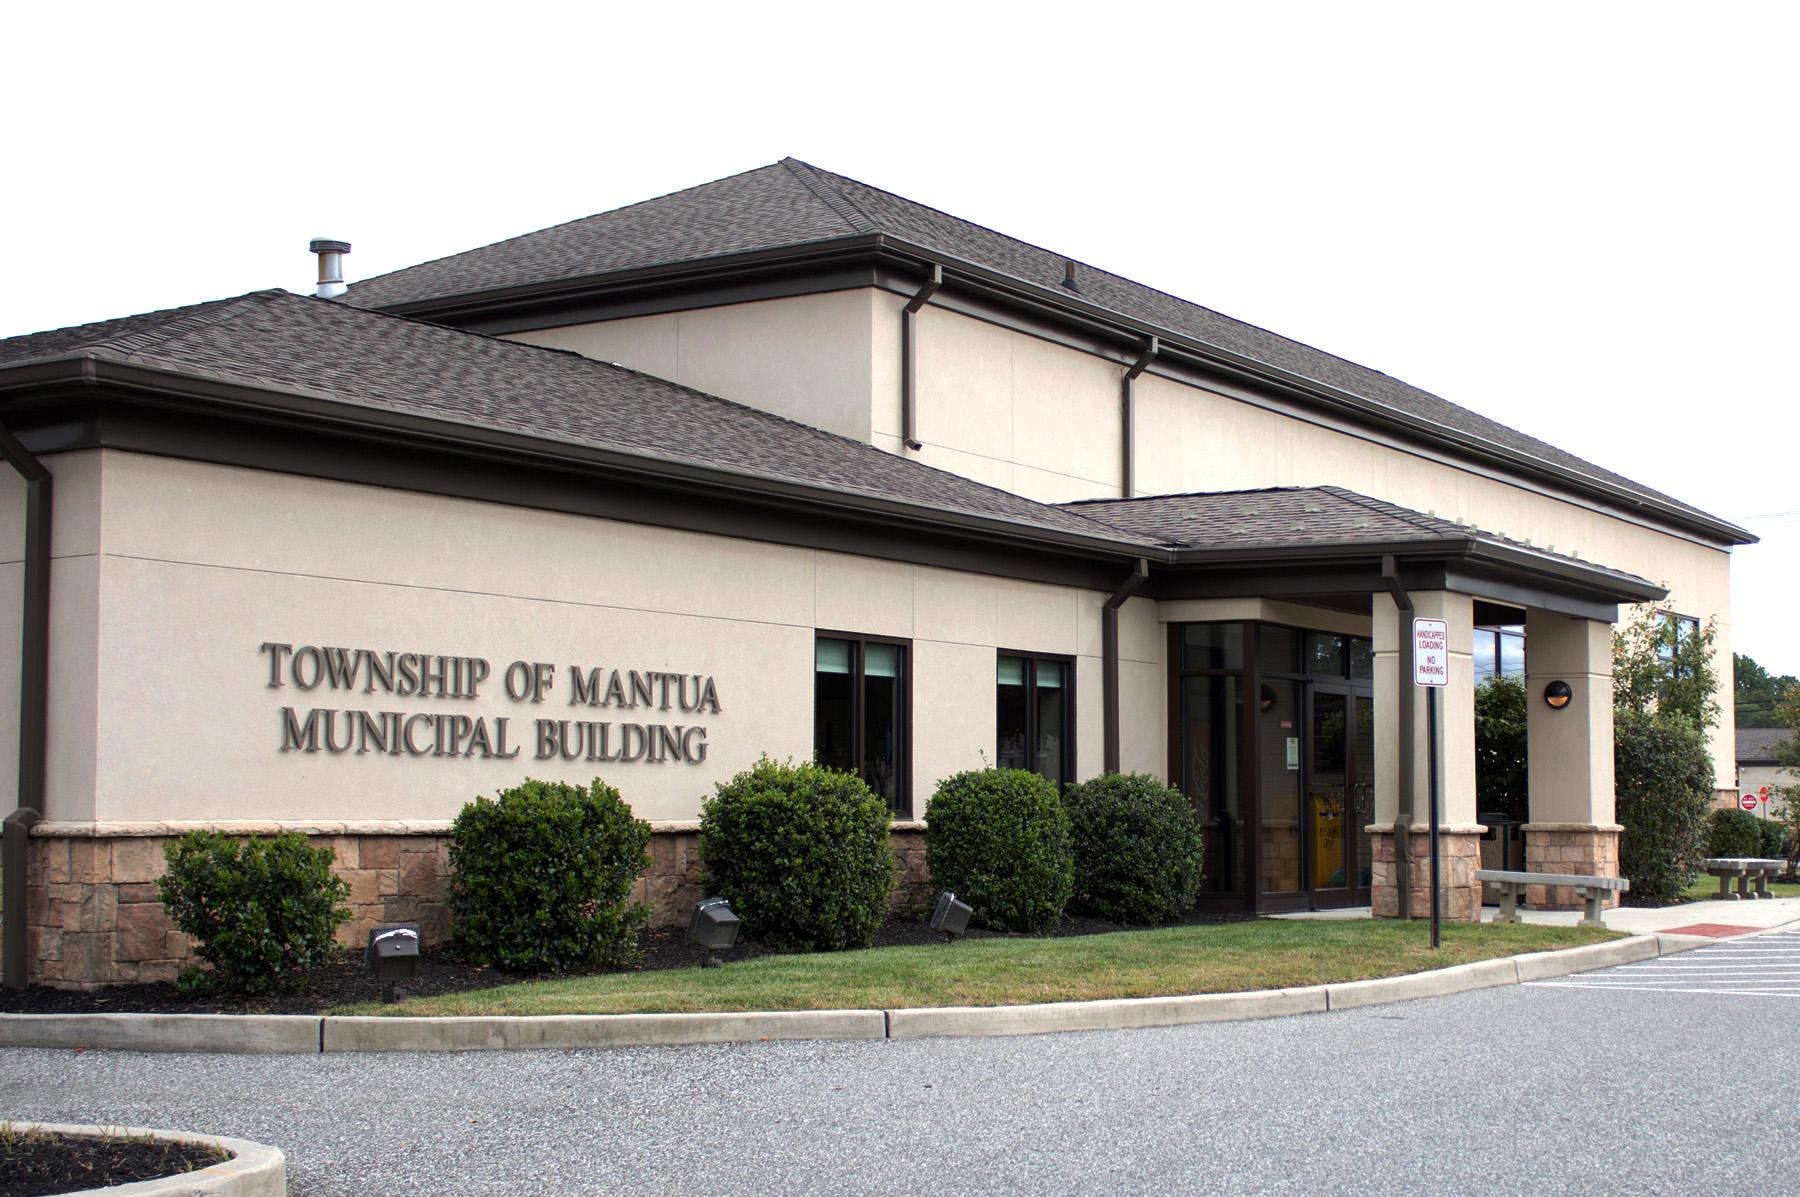 Township of Mantua Municipal Building